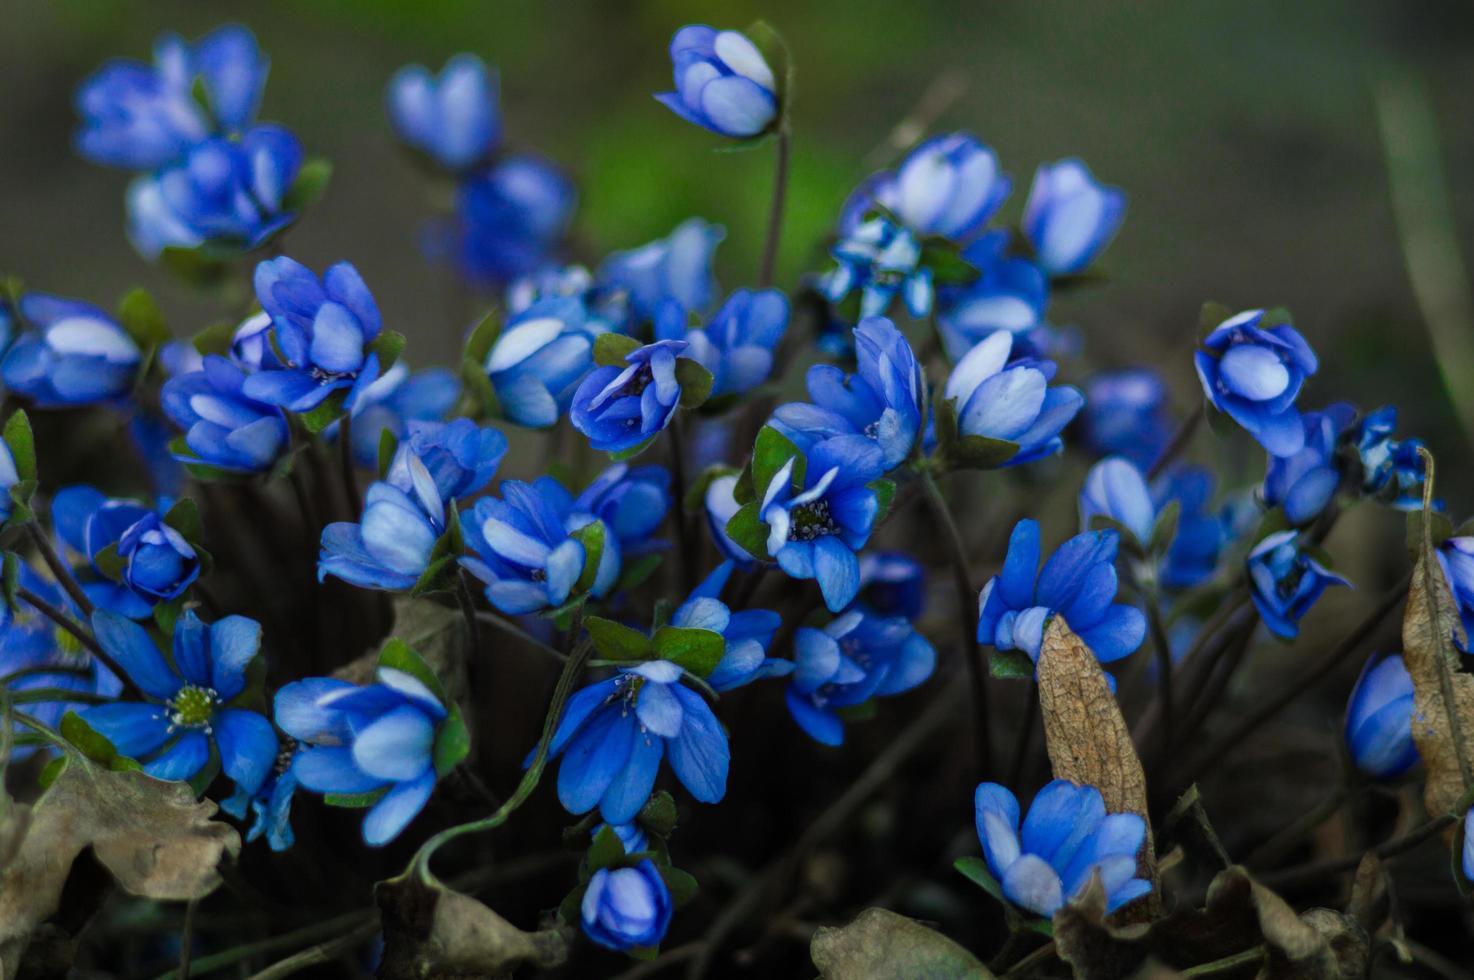 Blue  liverwort flowers closeup on blurred background photo